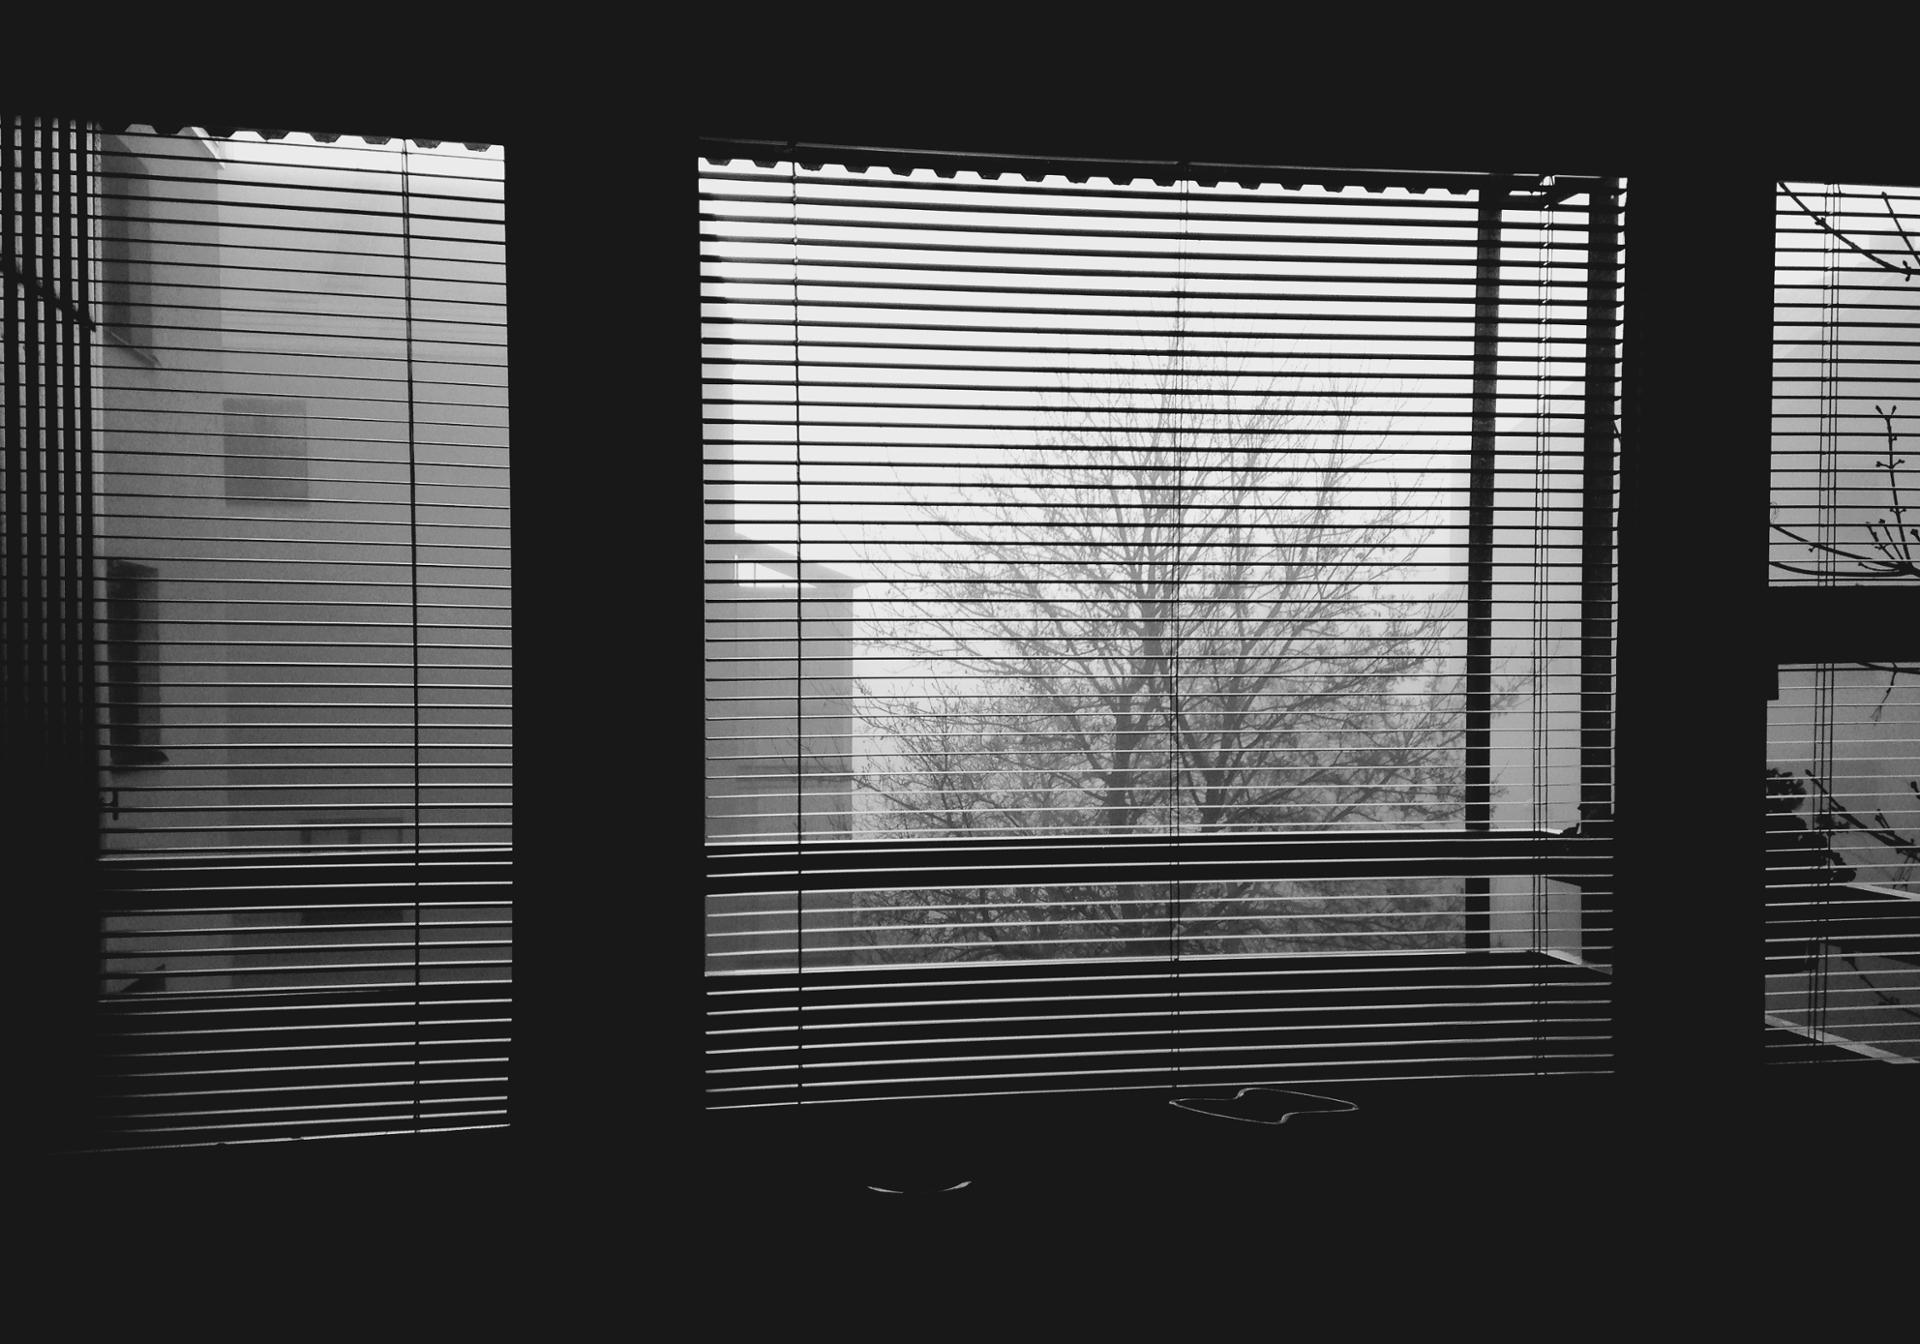 Les matins d'hiver en Suède